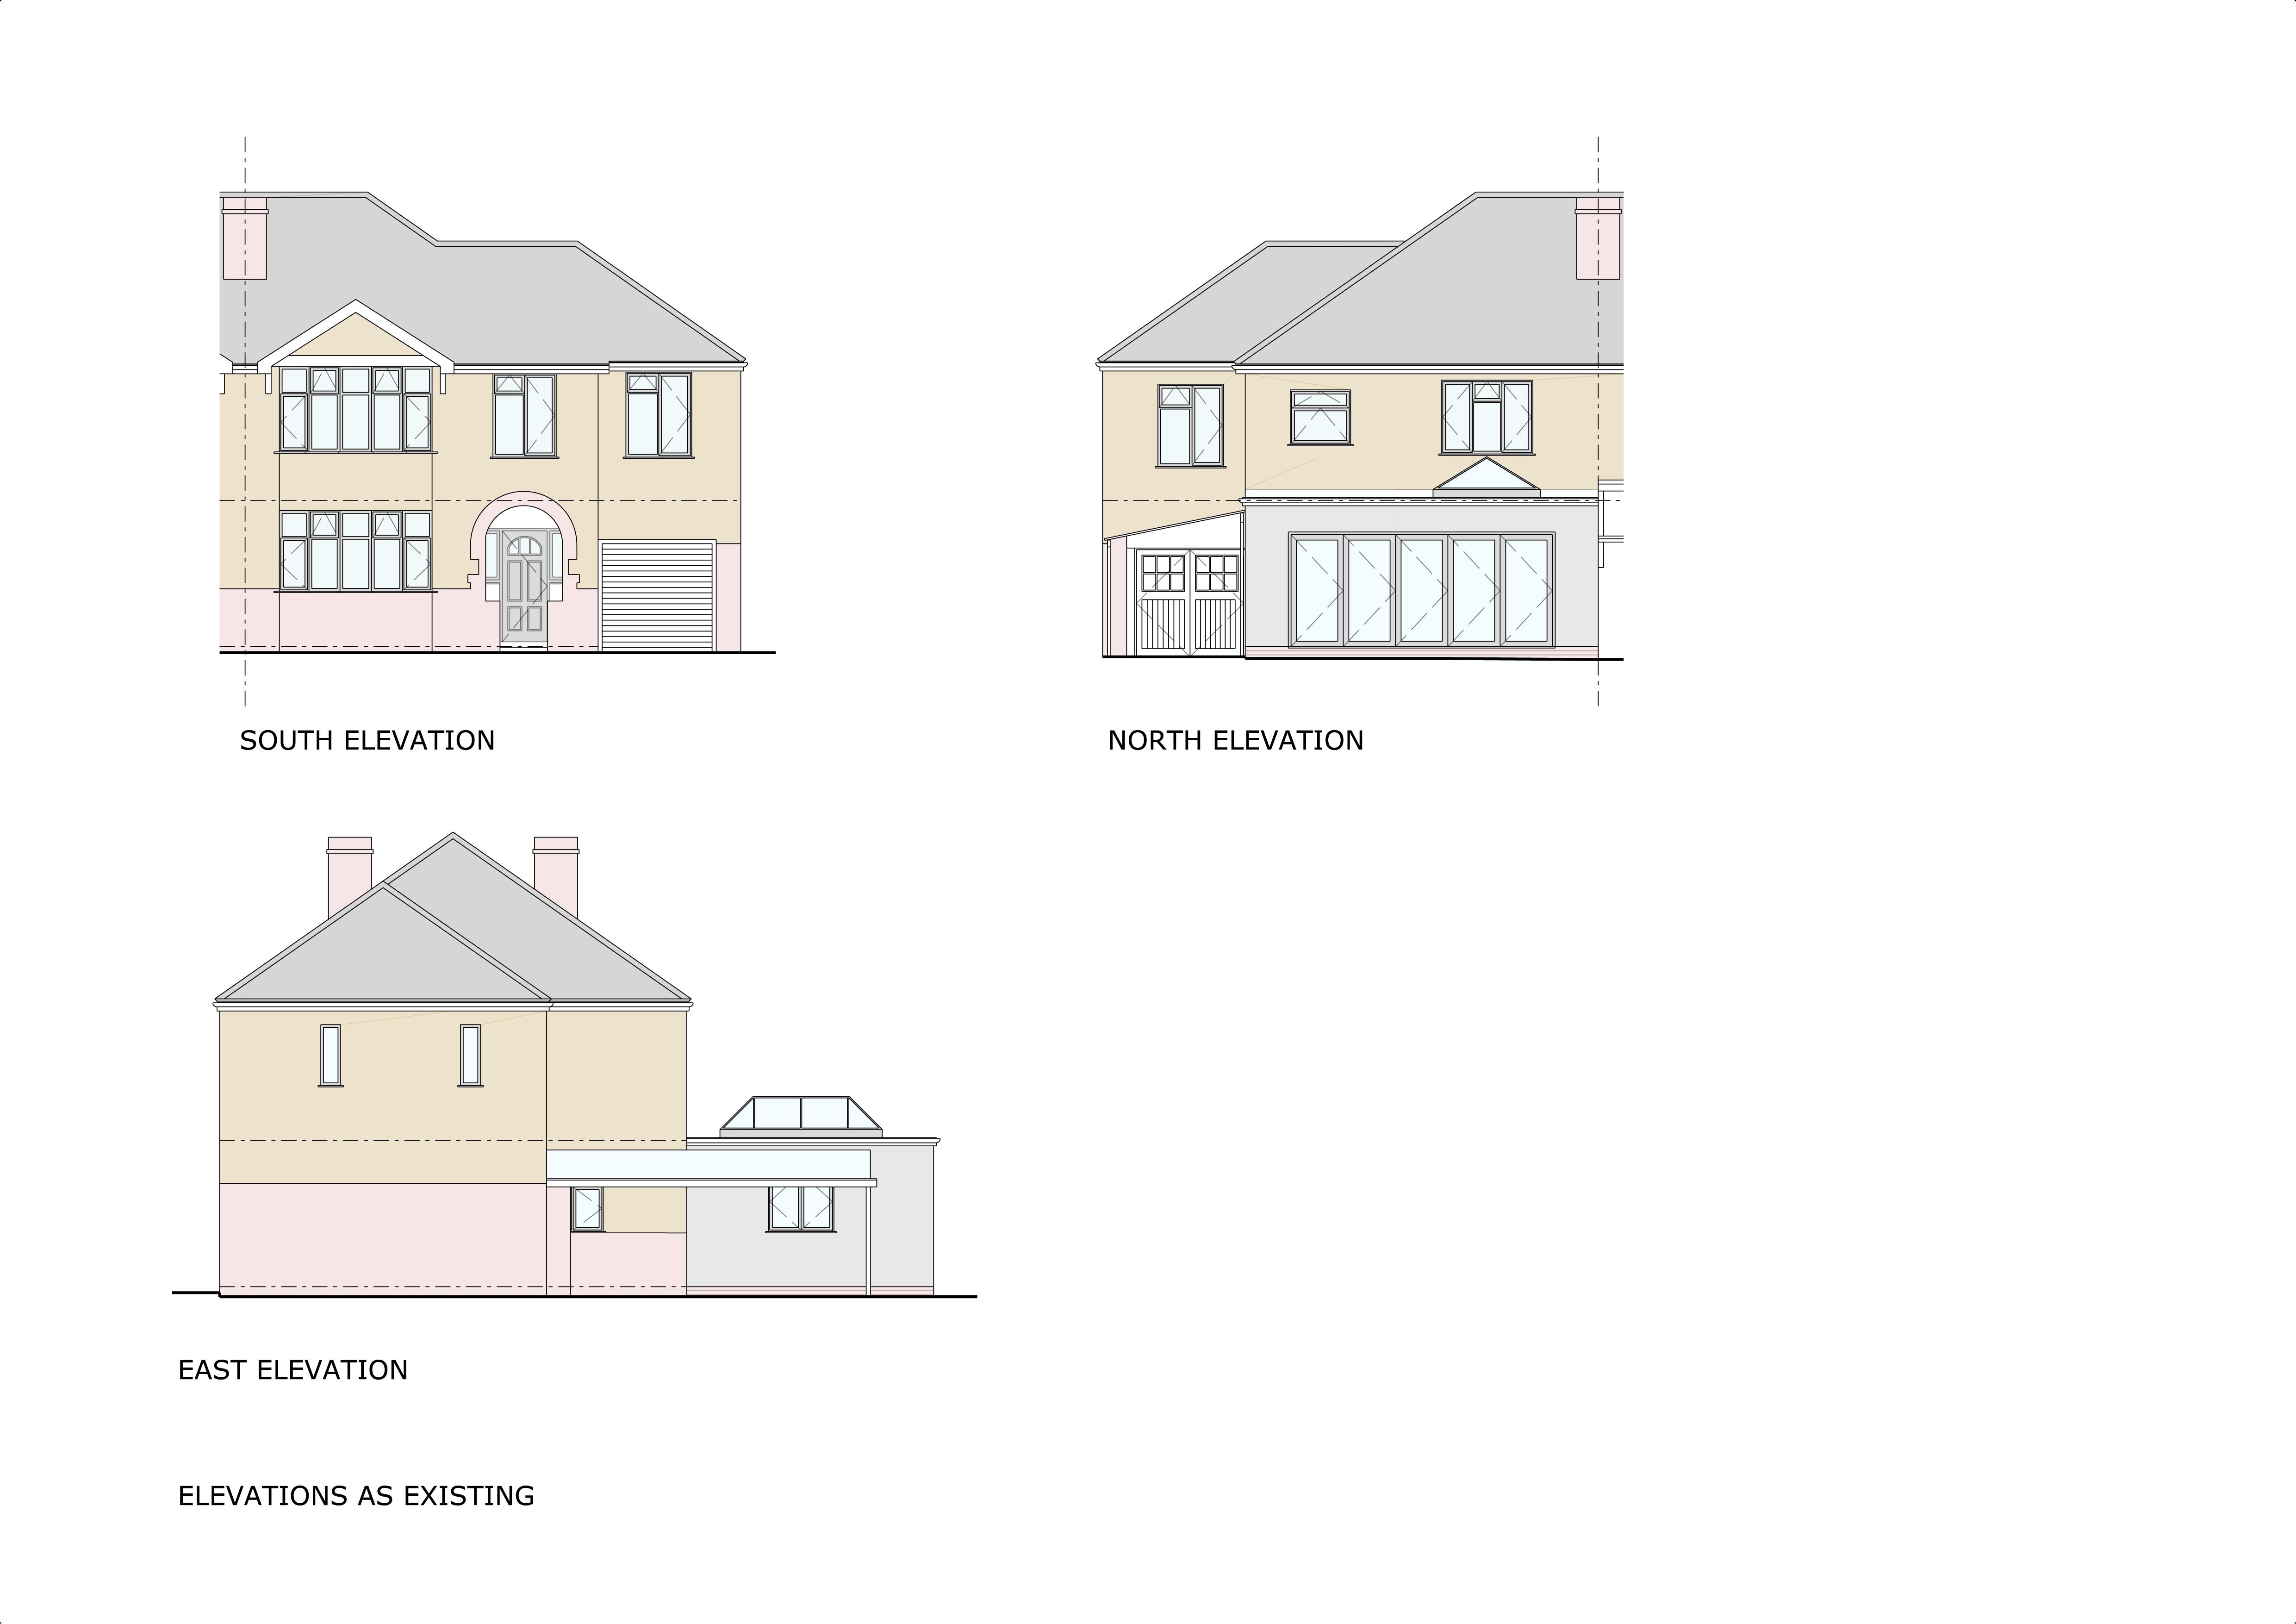 255 Ledbury Rd Proposed Elevations